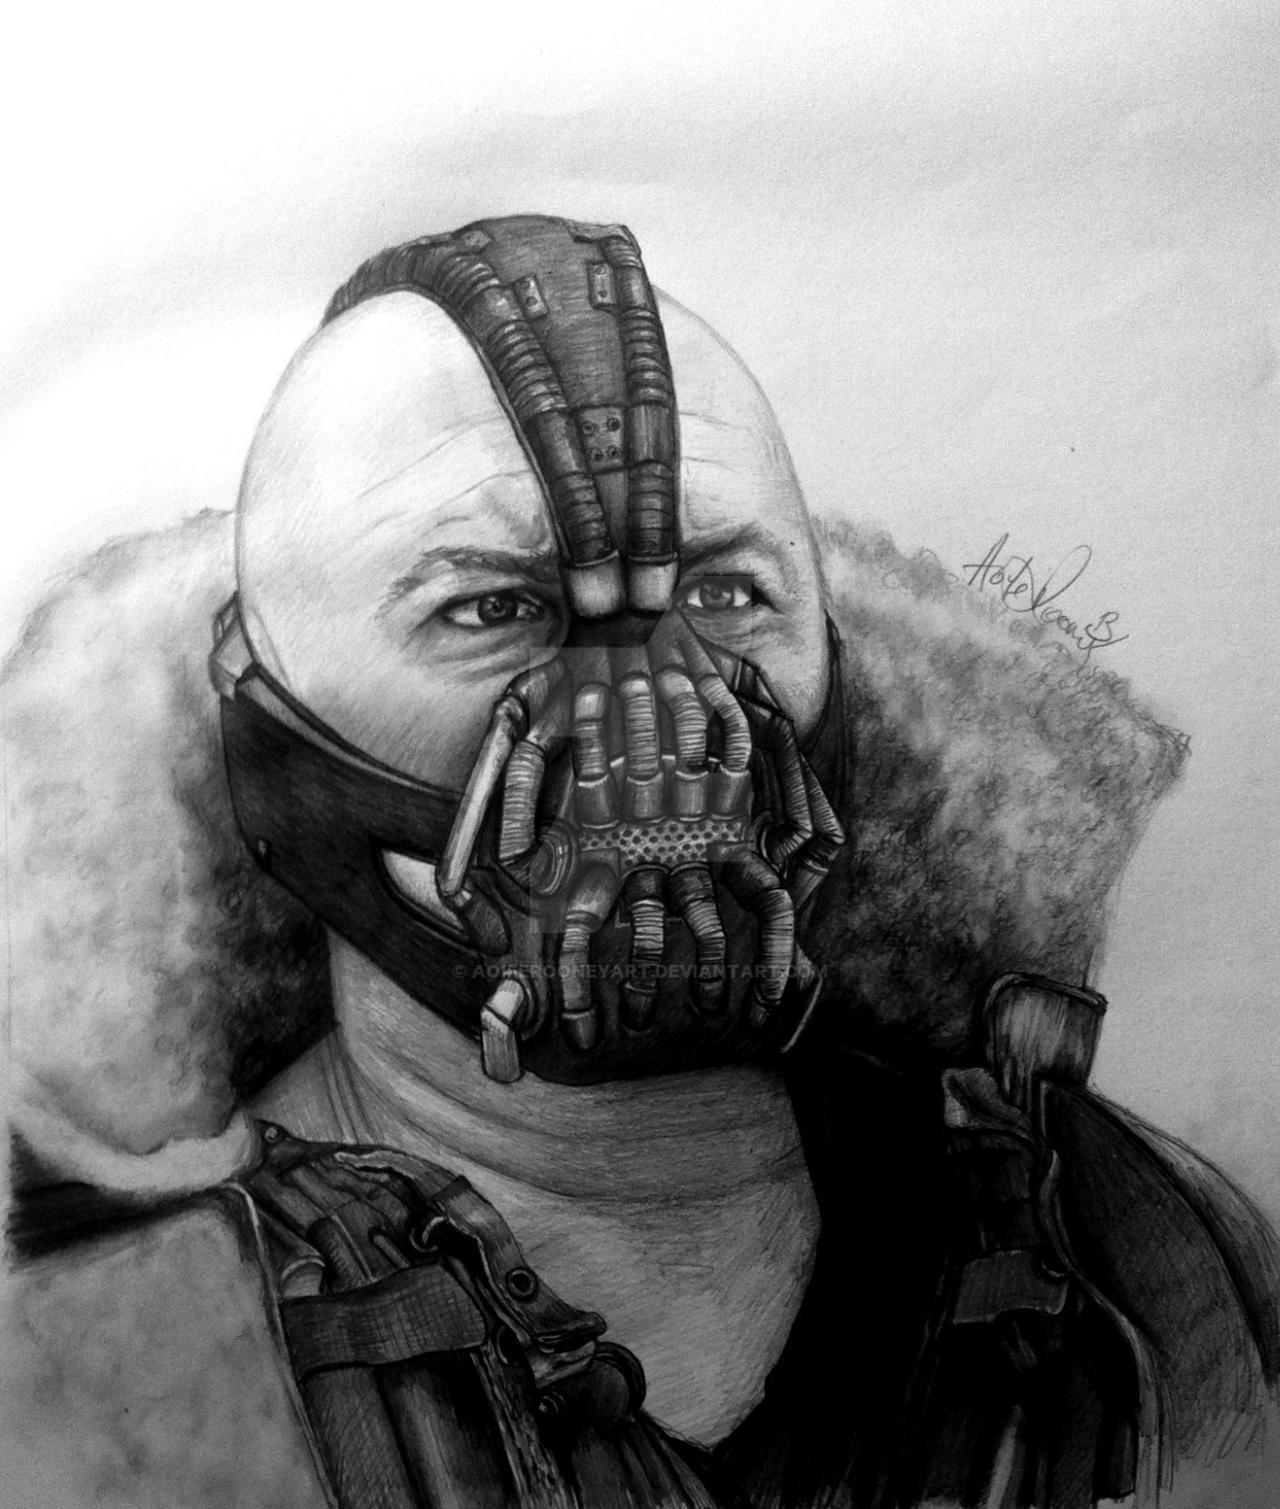 Bane pencil Portrait by AoifeRooneyArt on DeviantArt